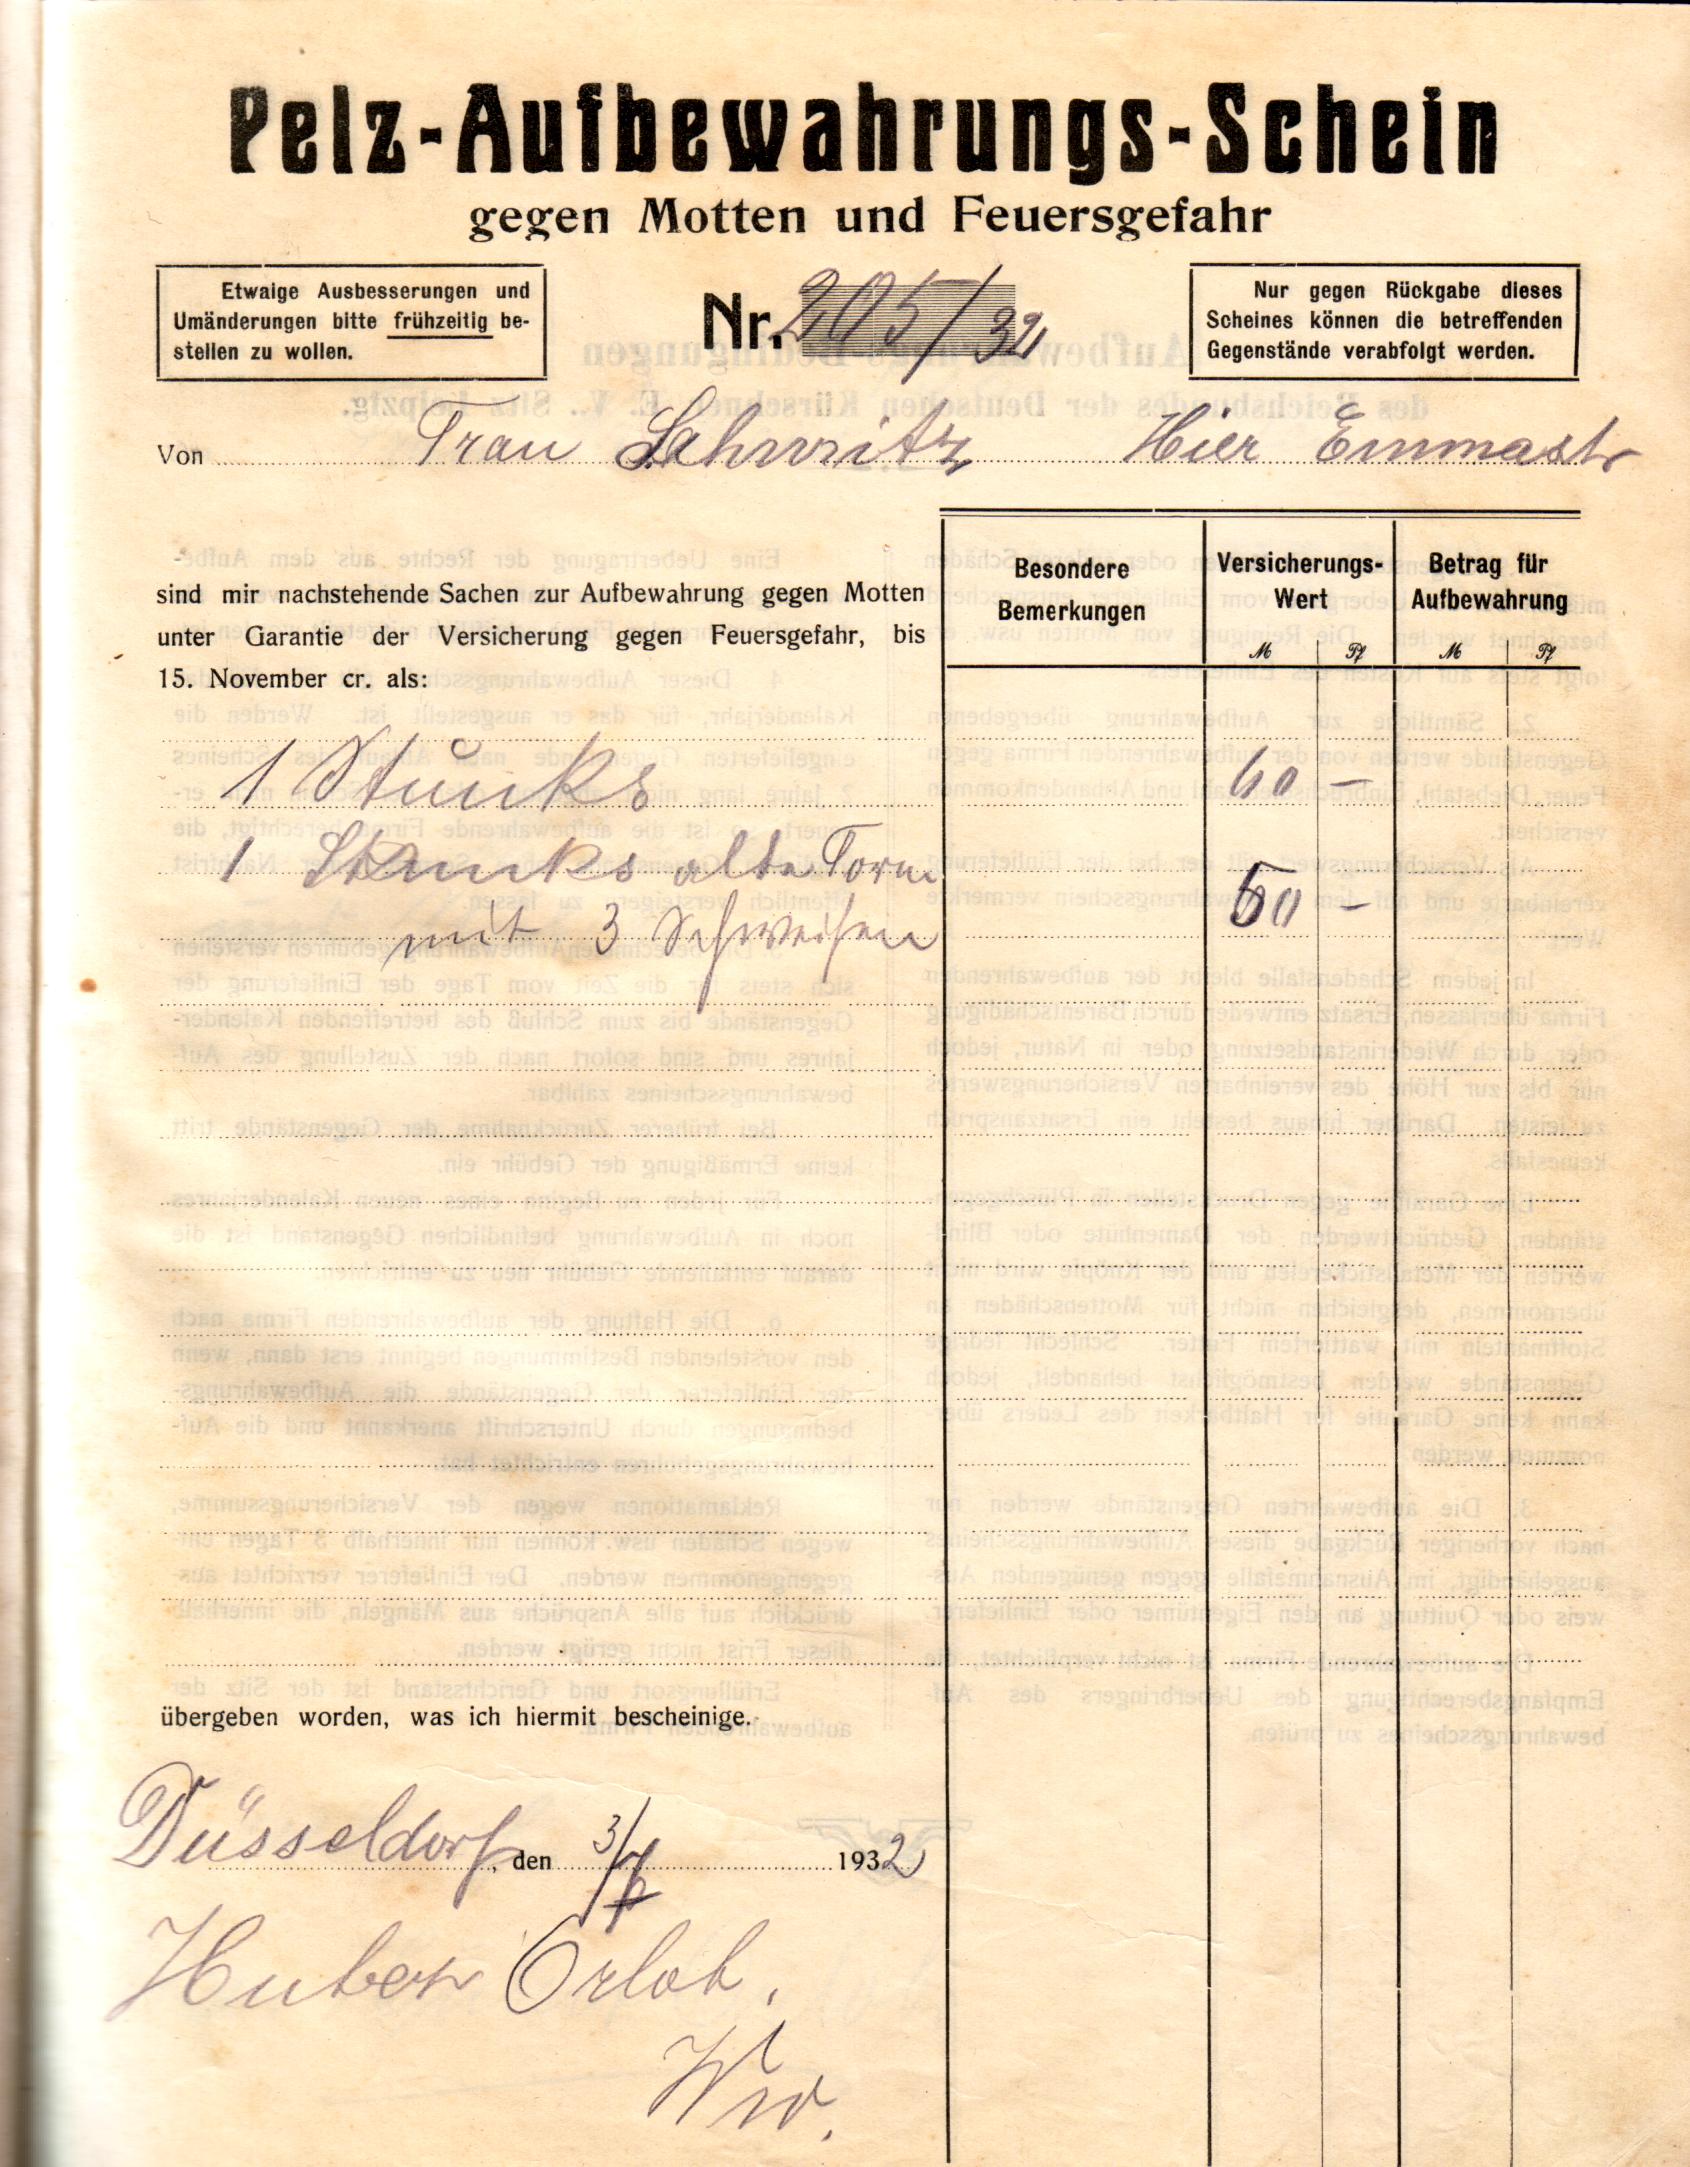 Len Düsseldorf file pelz konservierungs buch der firma orlob düsseldorf 1932 1939